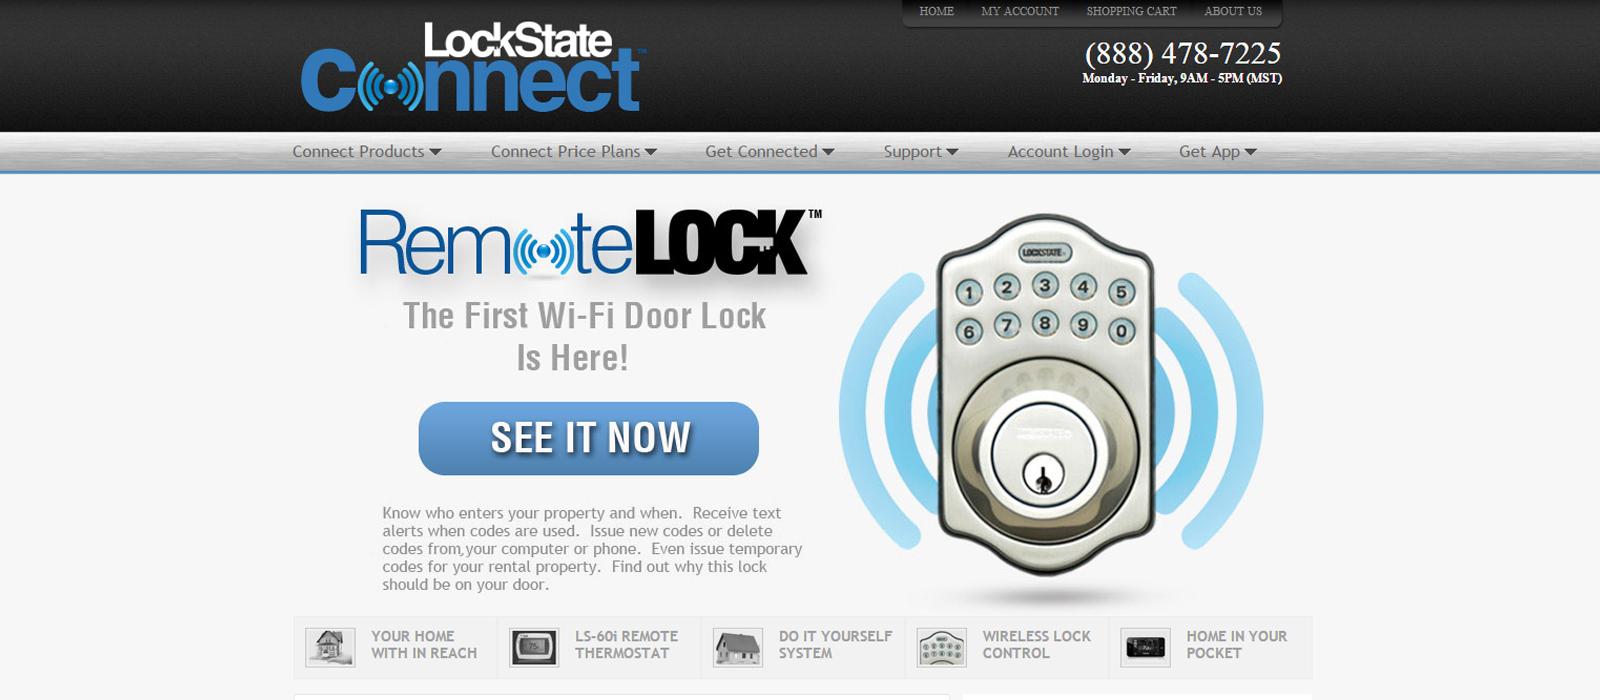 LockStateConnect